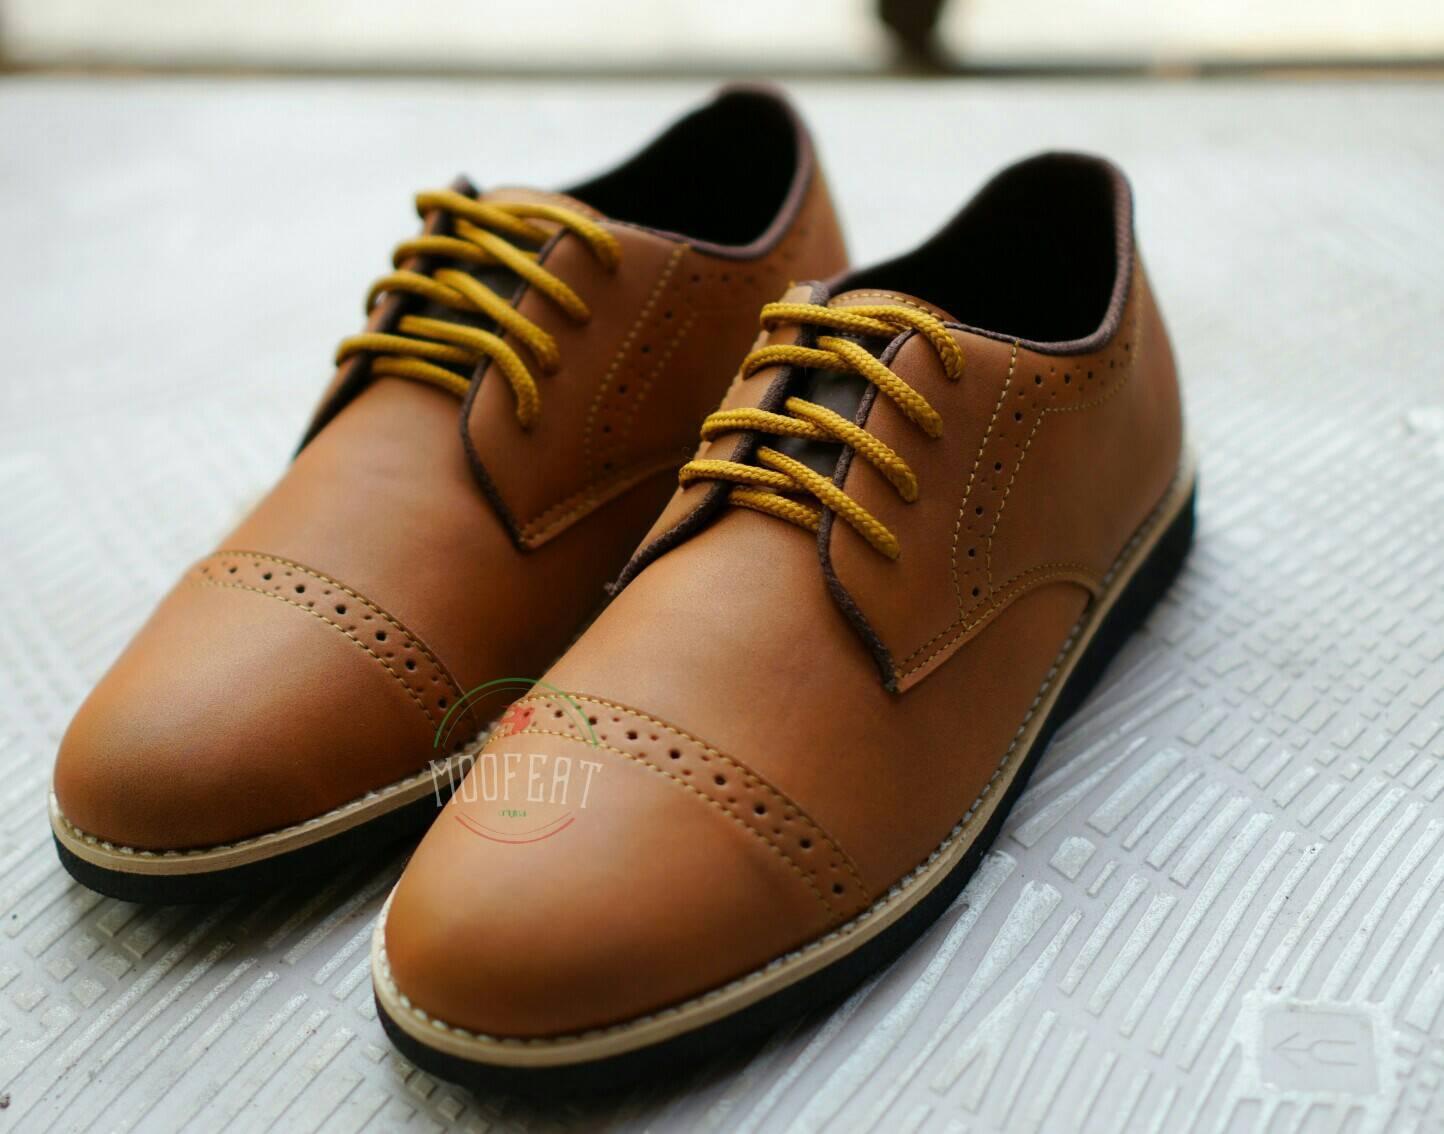 Sepatu EVERBEST Payson Original Terbaru Hitam Black Pansus Loafer Loafers Slip On Formal Kantor Kerja Pria